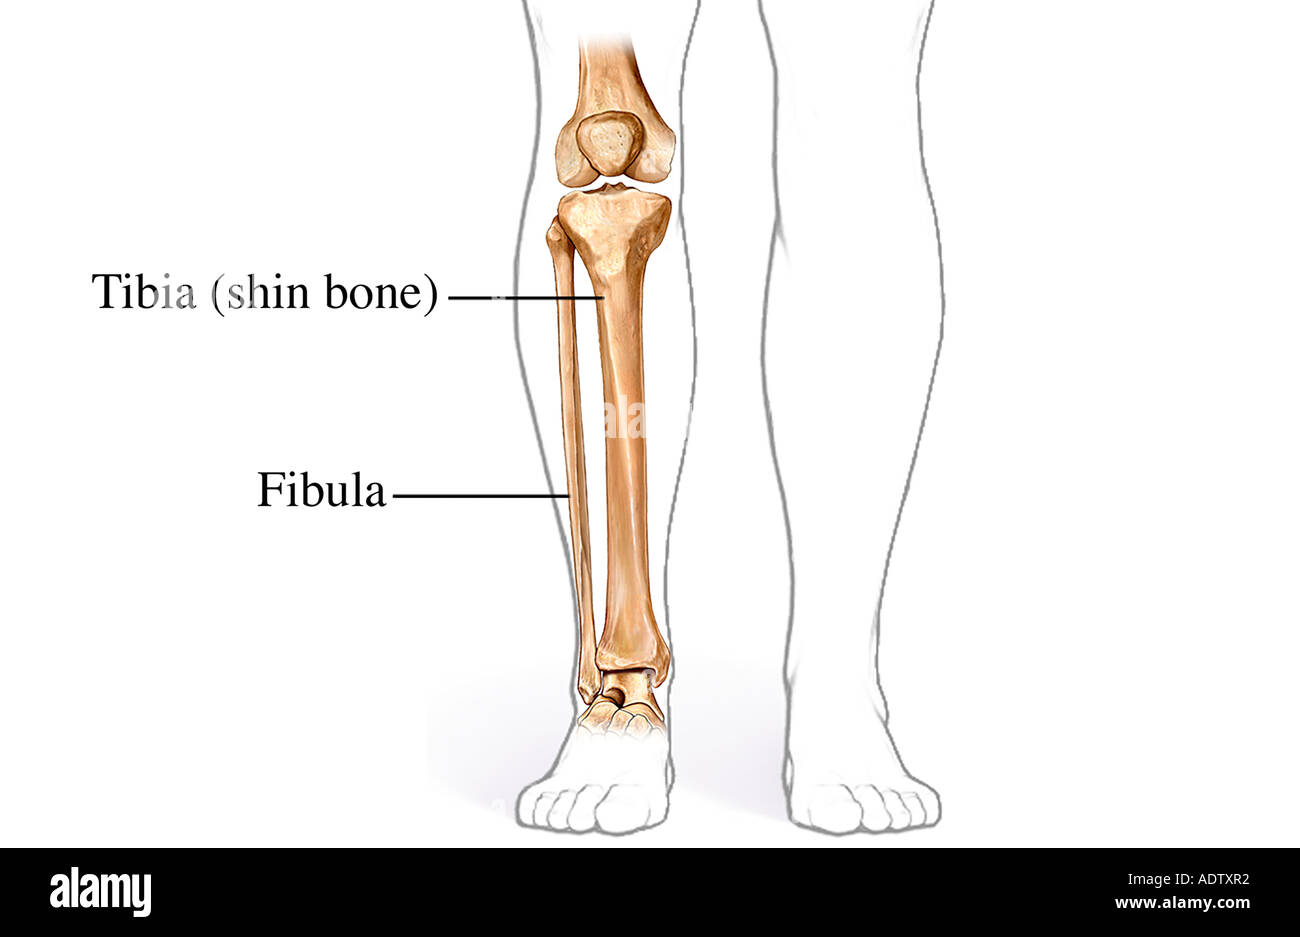 Bones Of The Lower Legs Stock Photos Bones Of The Lower Legs Stock